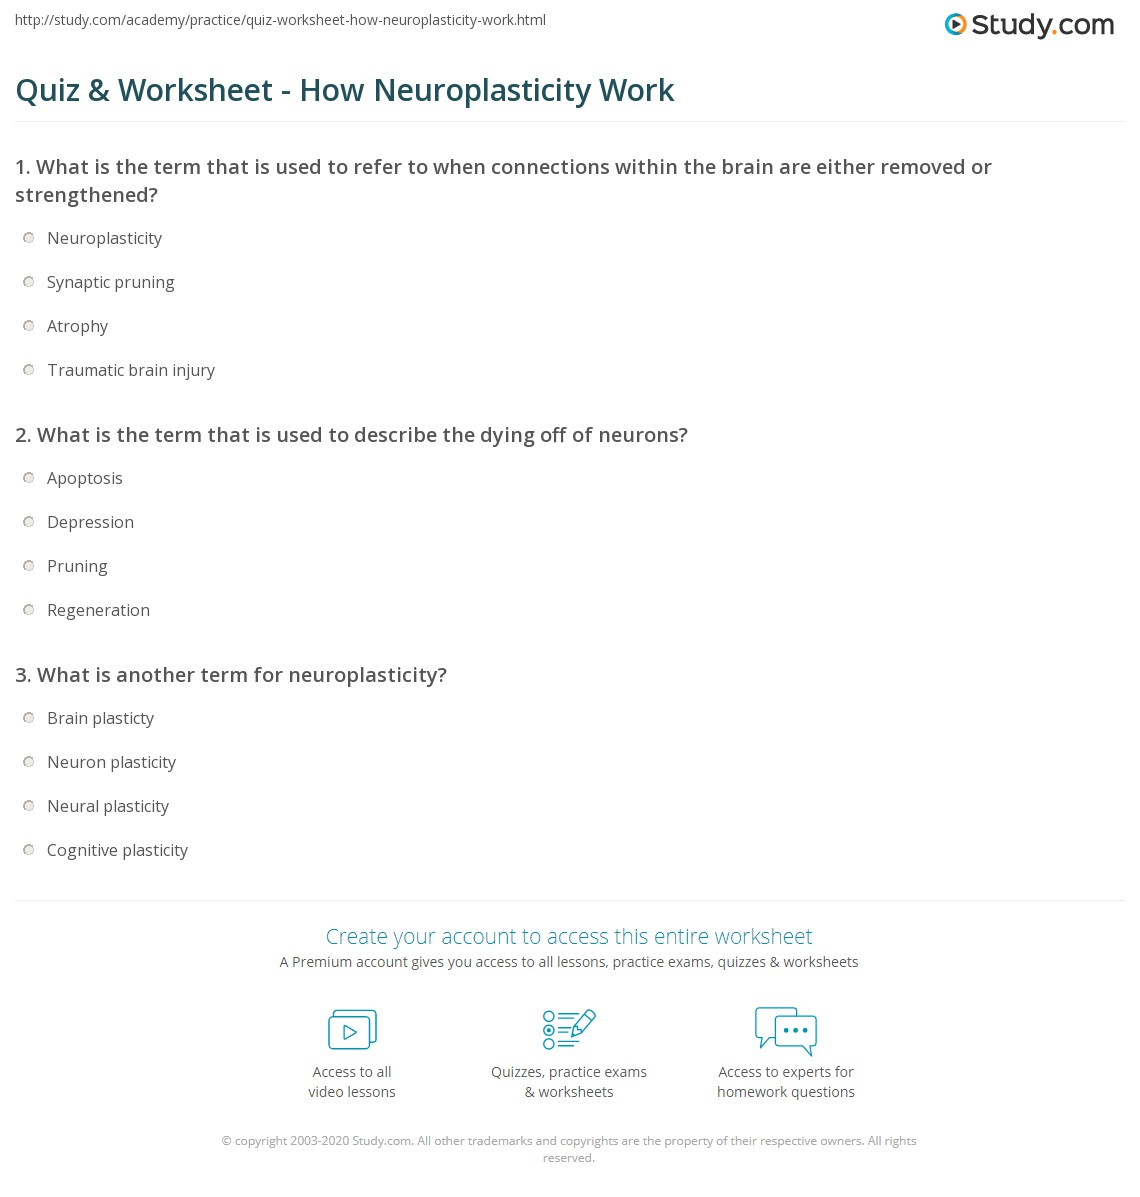 quiz & worksheet - how neuroplasticity work | study